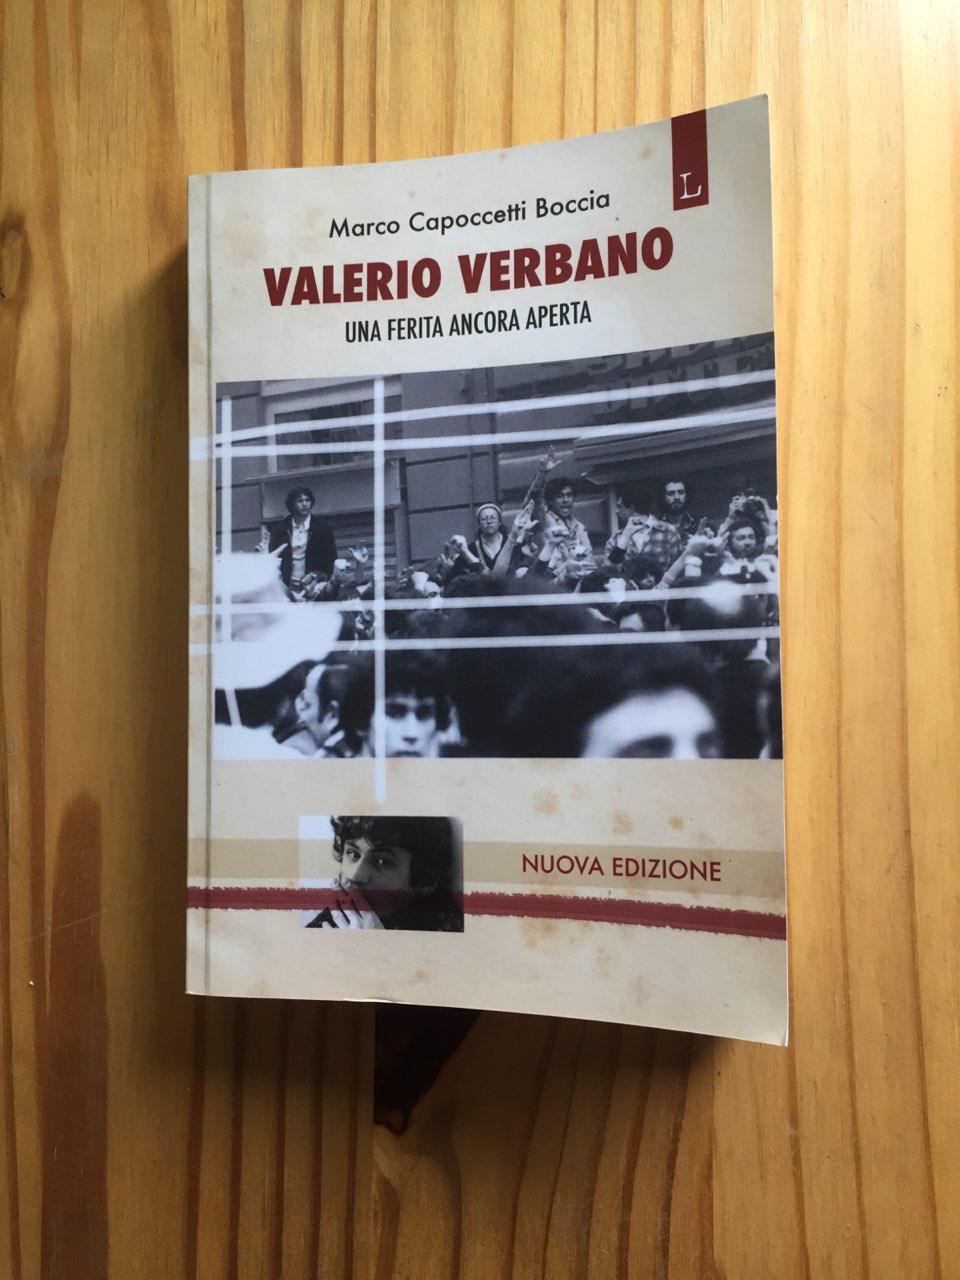 Valerio Verbano, una ferita ancora aperta